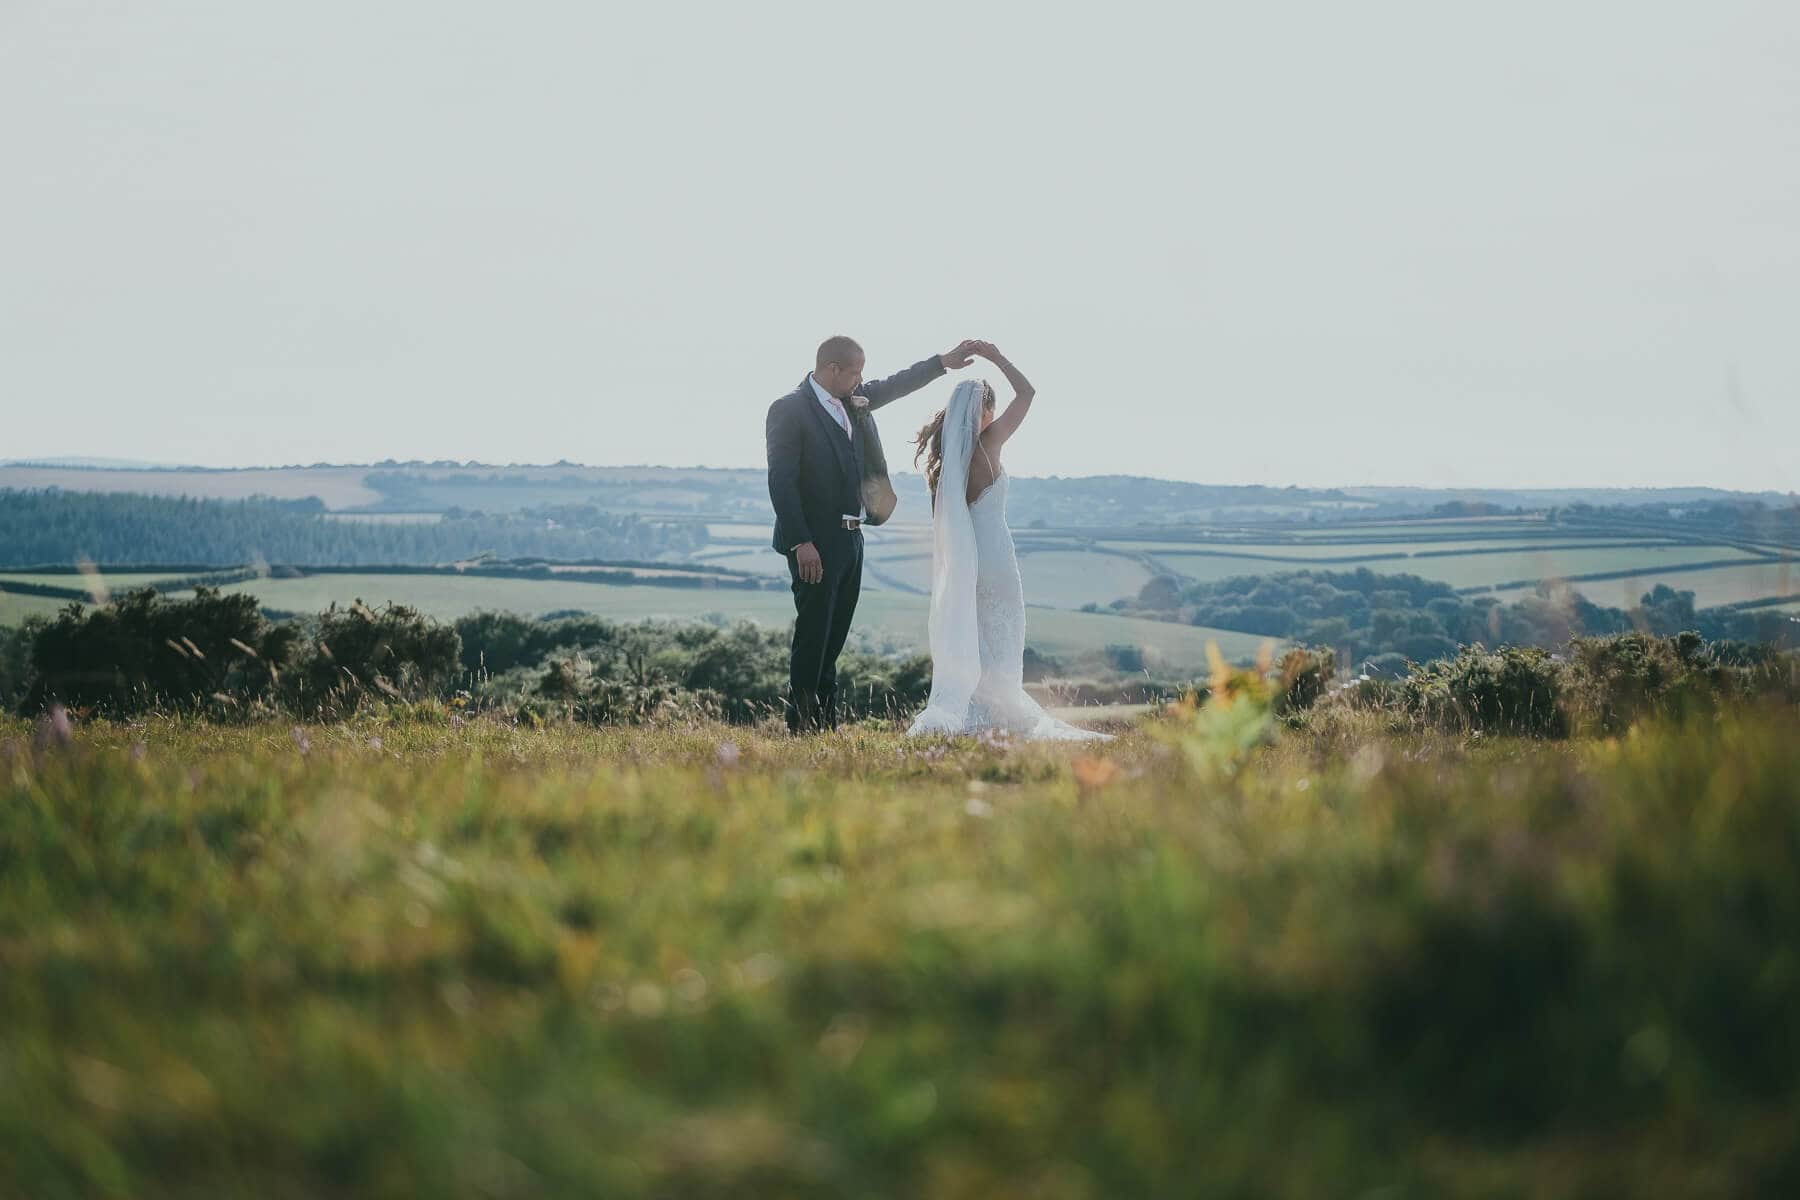 Trevenna Barns Wedding Photography | Helen & Daniel